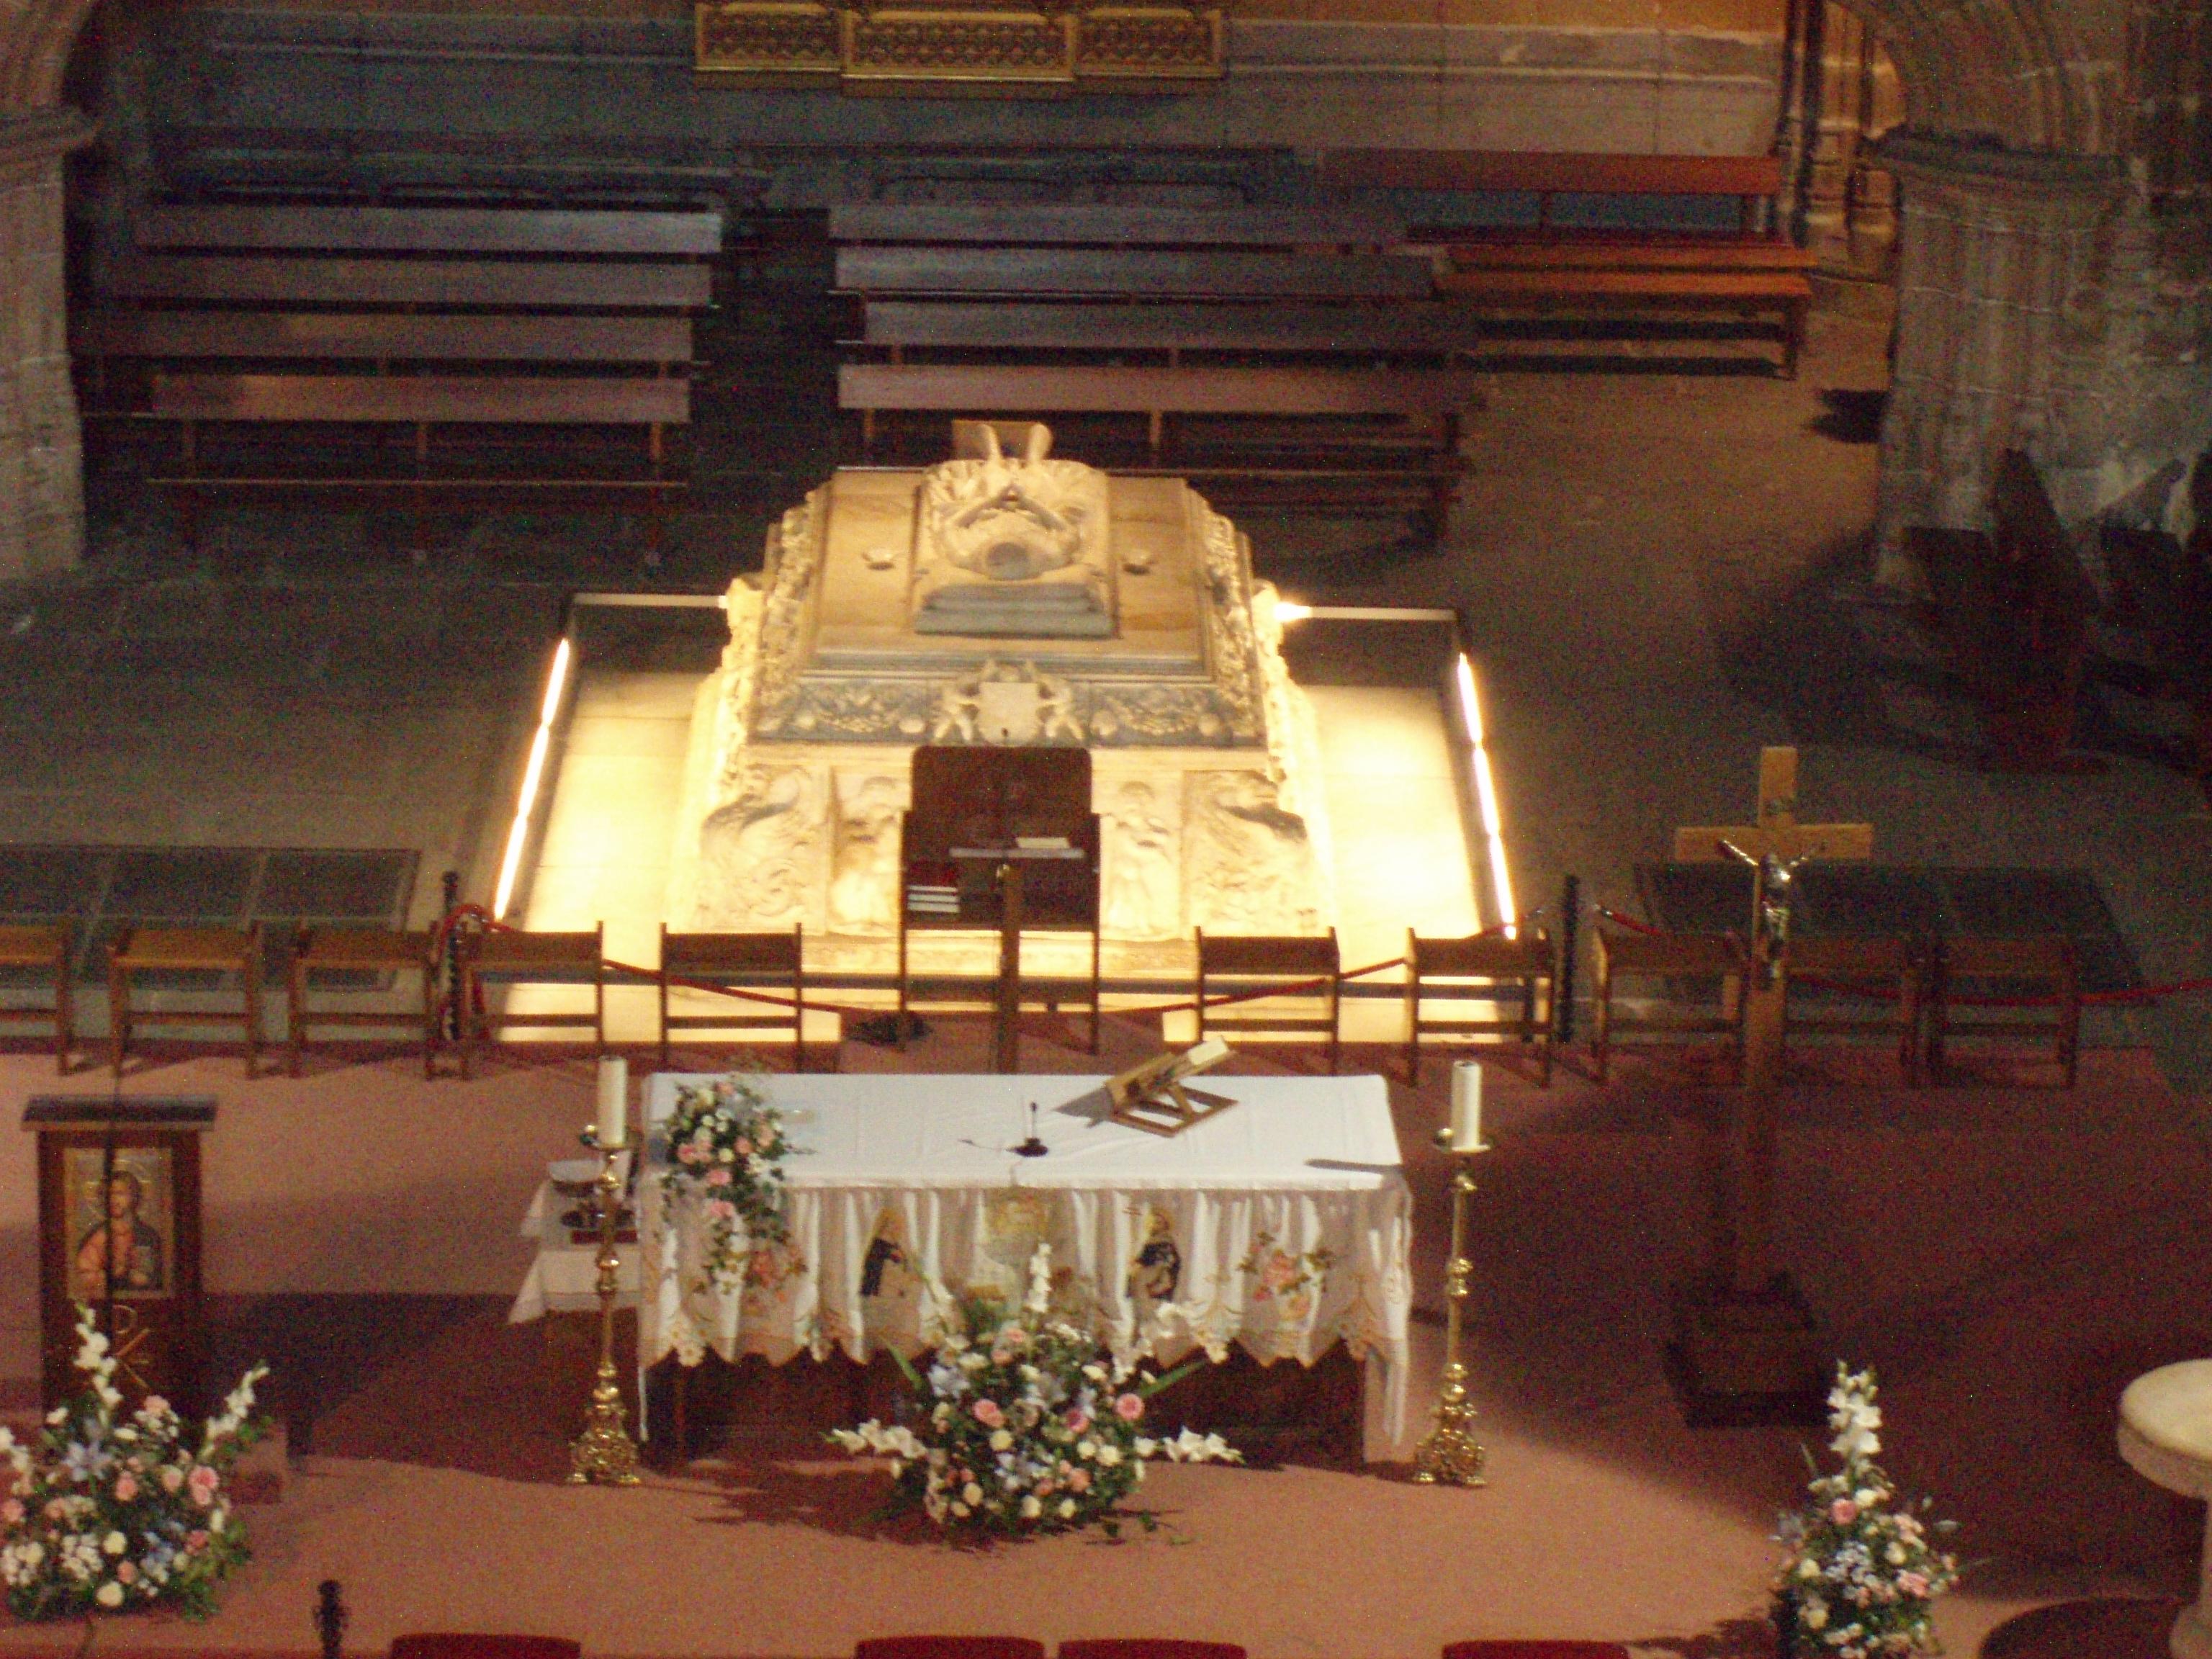 File:--Ávila--. --Real Monasterio de Santo Tomás--.JPG ...